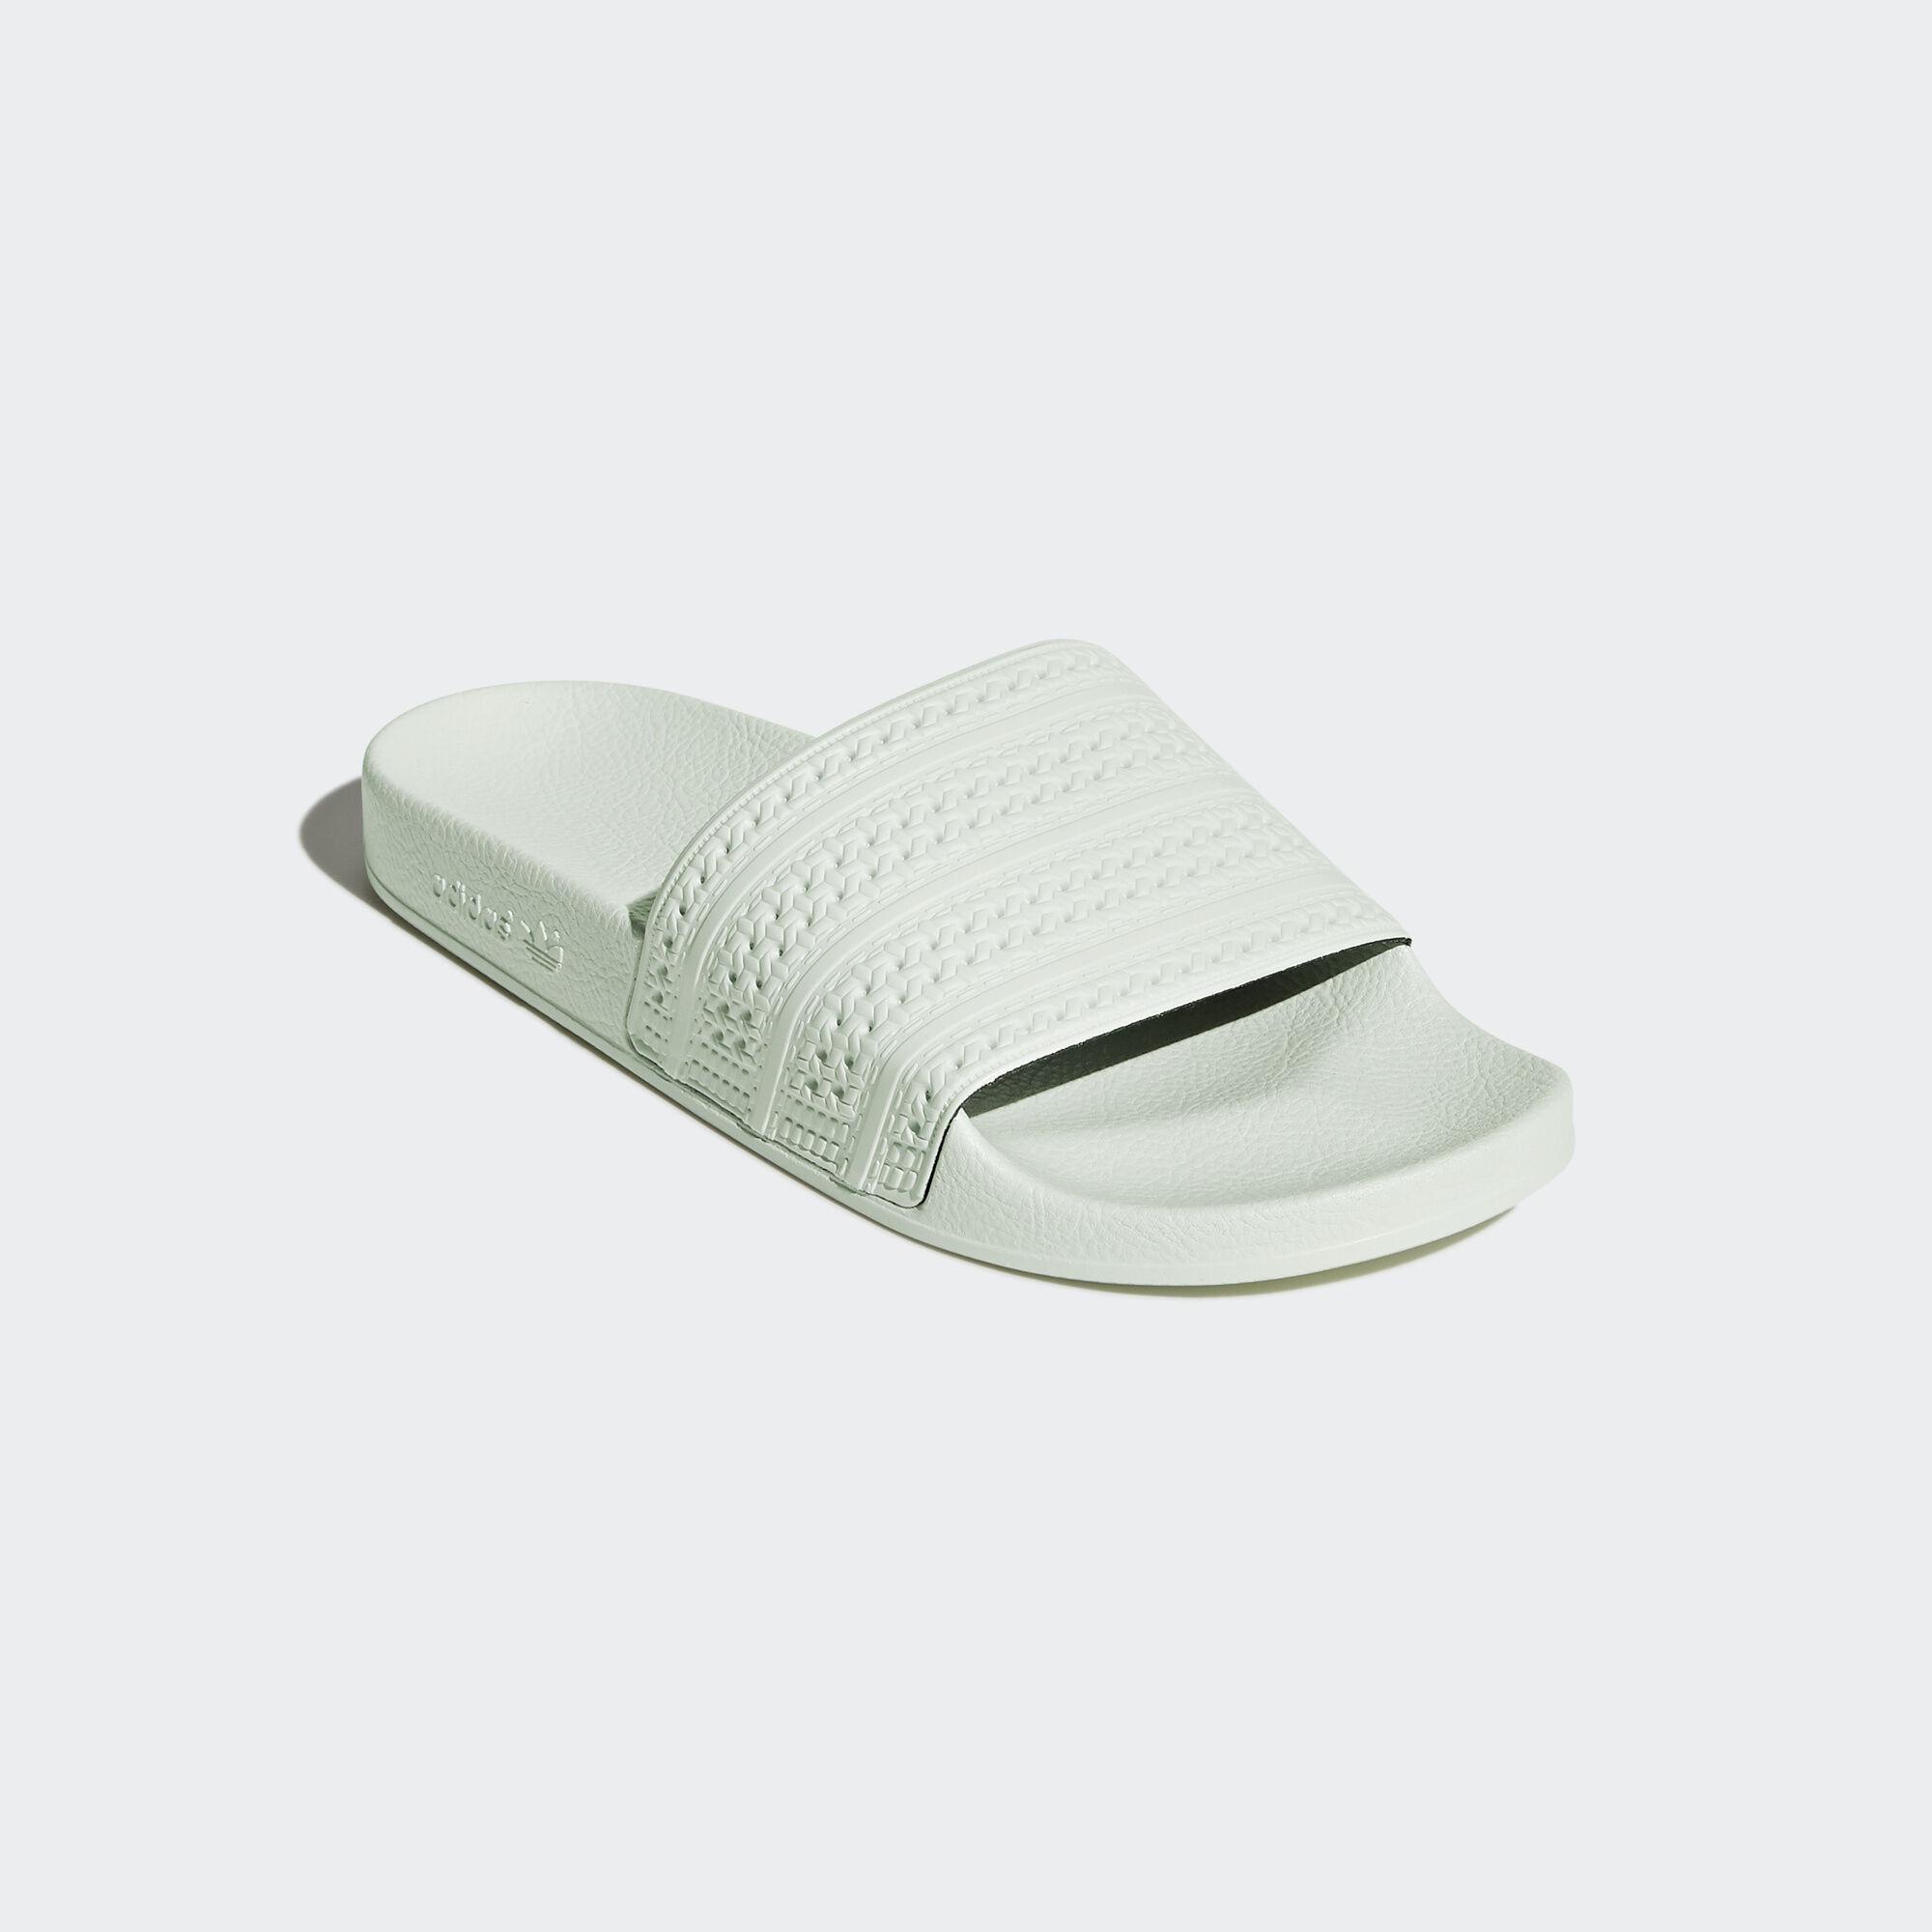 e473fcc90c8 Adidas Slippers Dames   Adidas Online Te Koop Bij Abottleofsanity ...